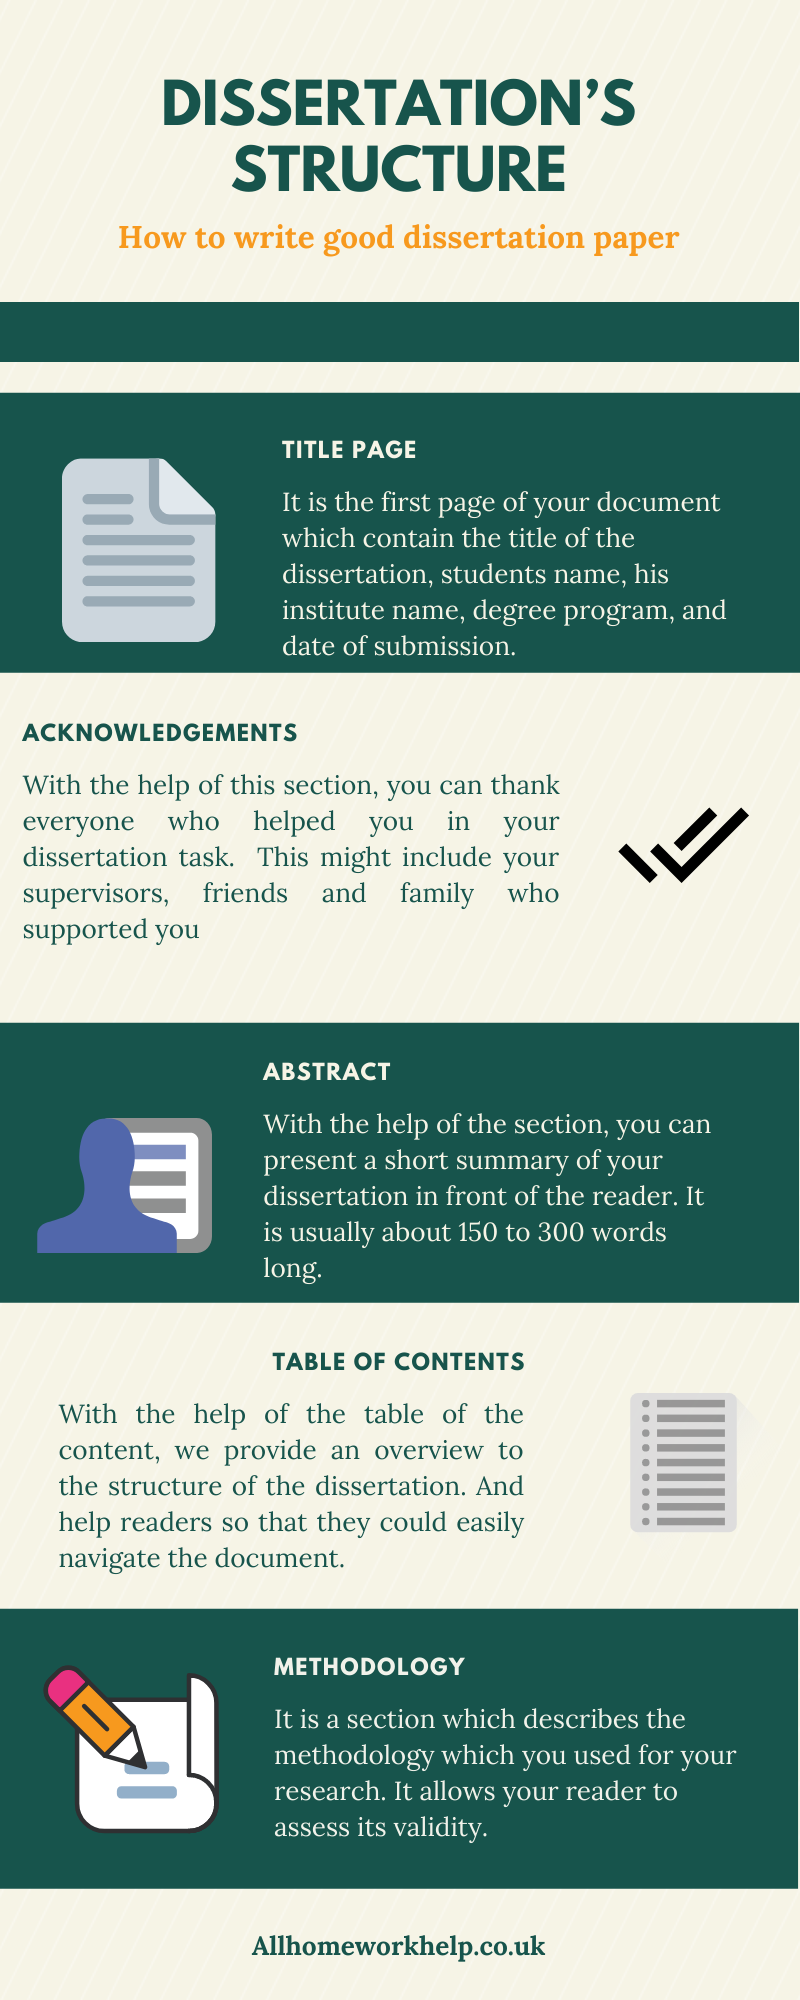 Dissertation's-structure